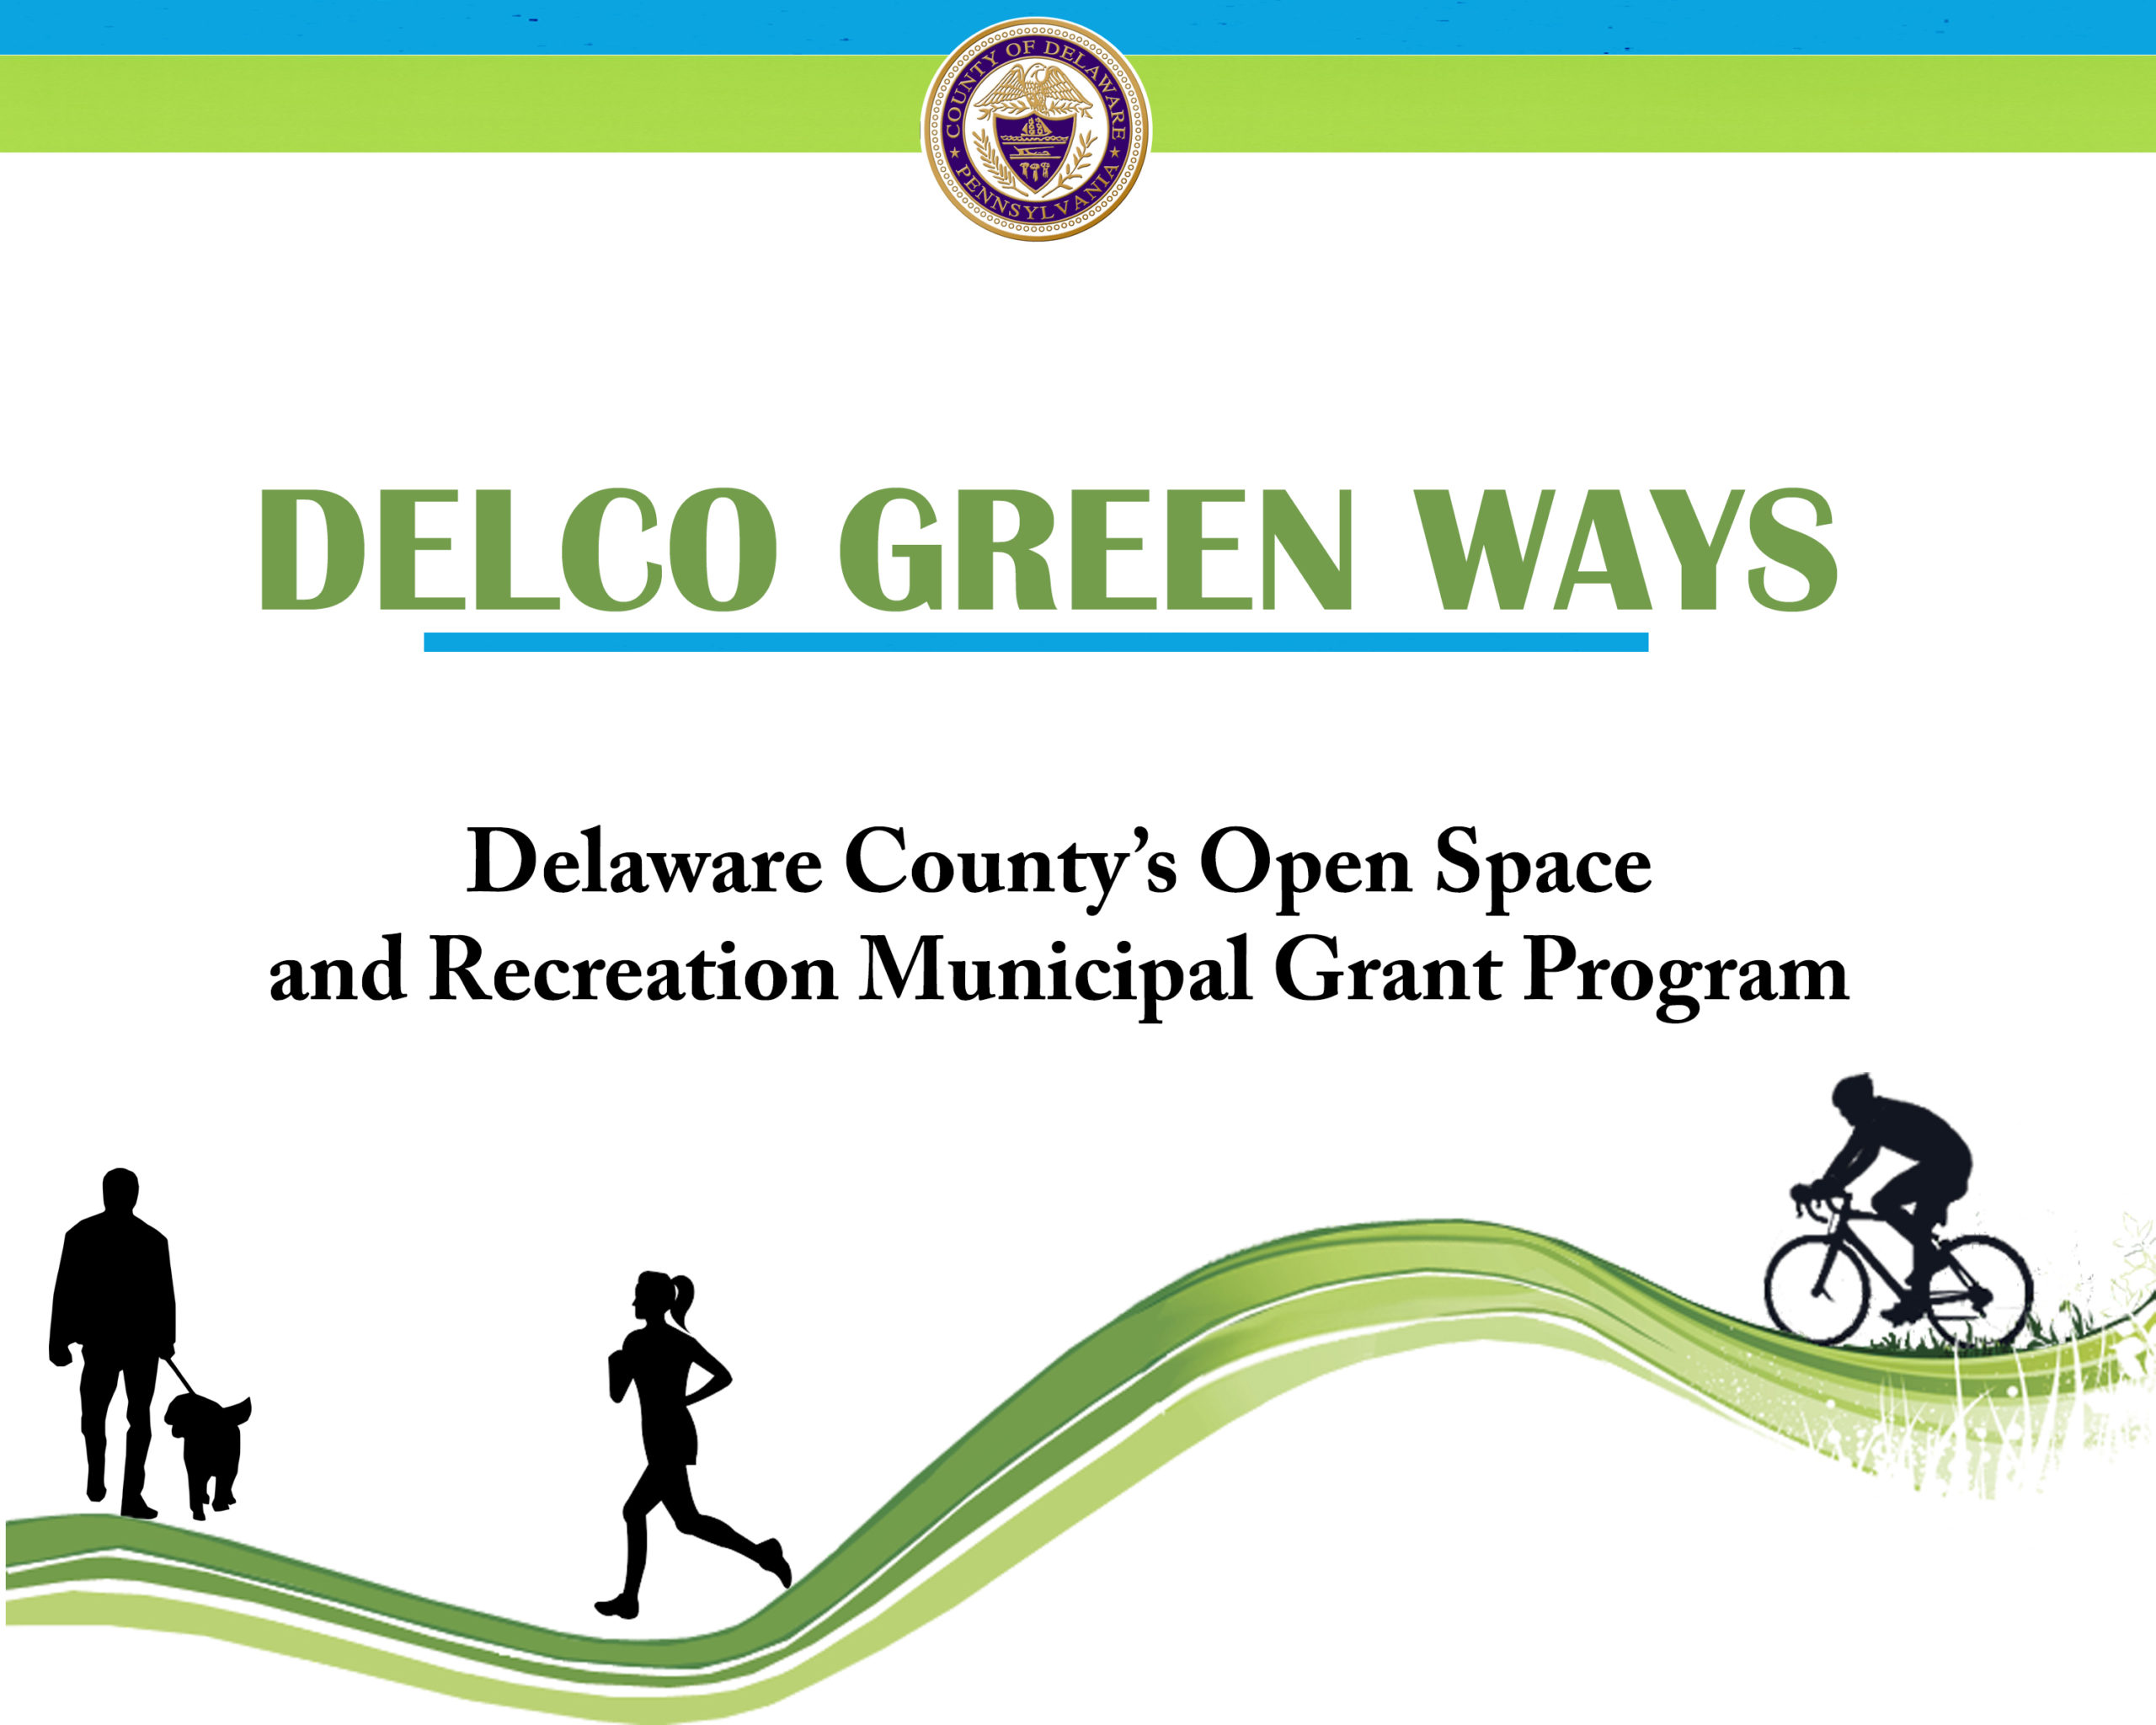 Delaware County Announces Municipal Grant Program for Open Space